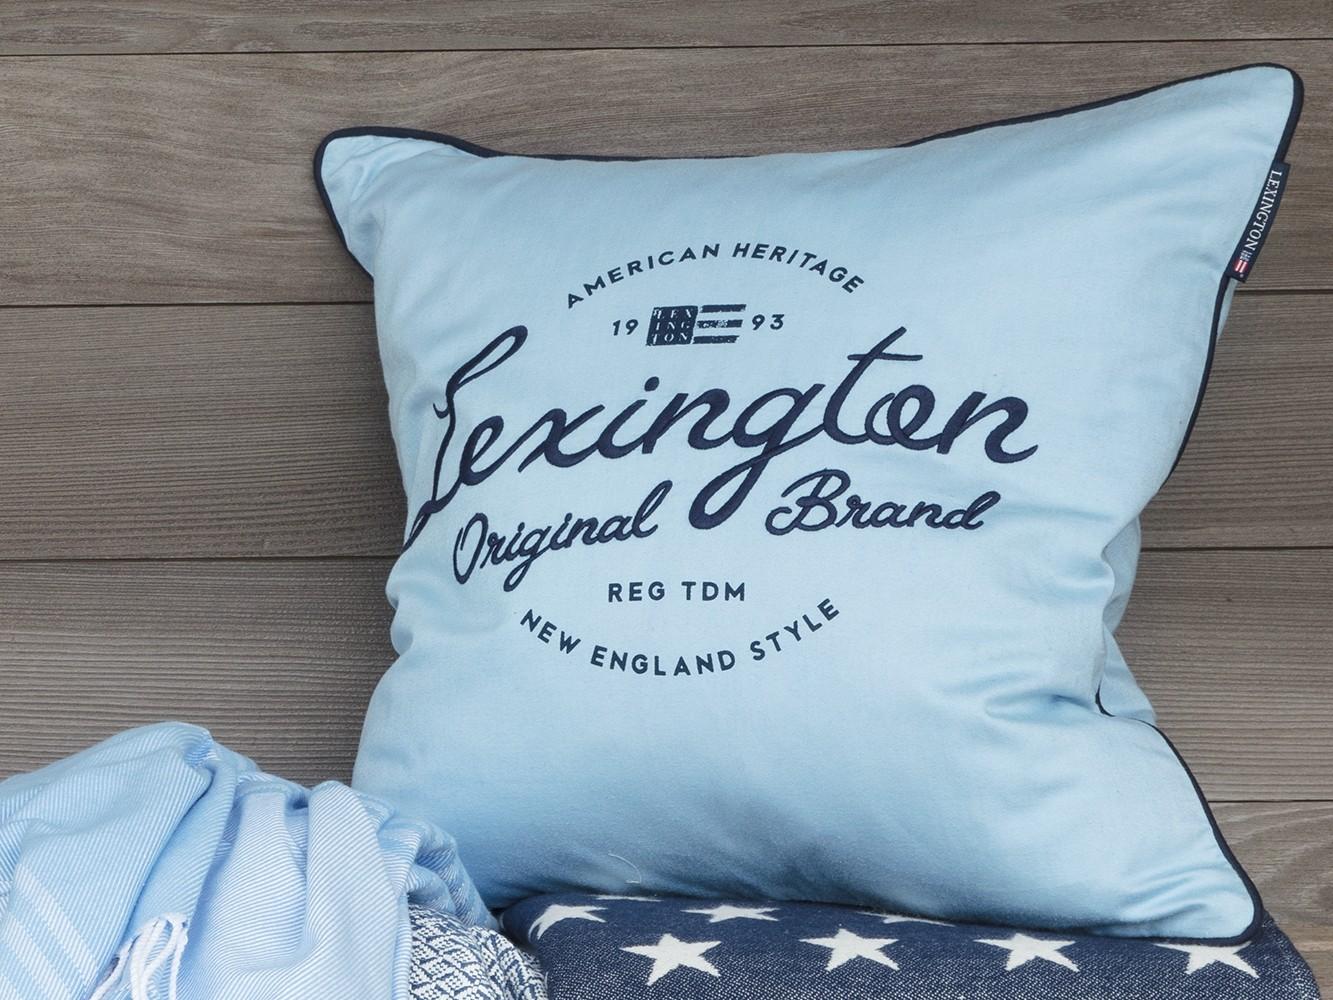 lexington company shop home fashion for men and women. Black Bedroom Furniture Sets. Home Design Ideas